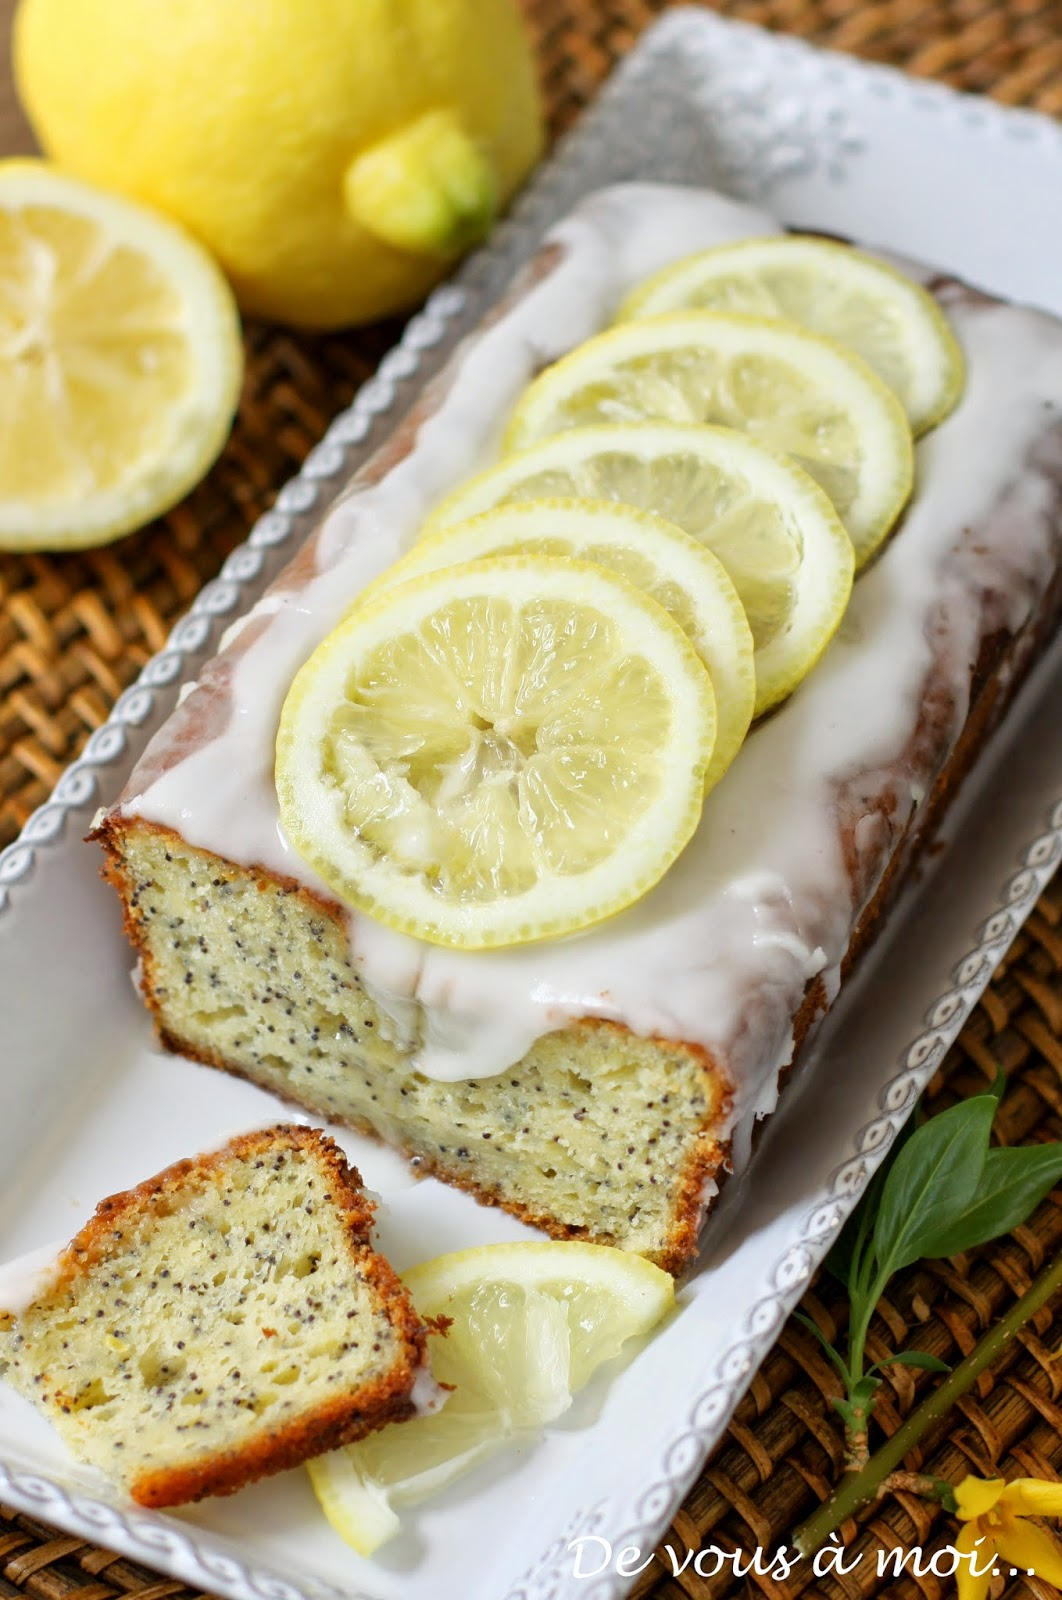 Gateau au yaourt citron vert